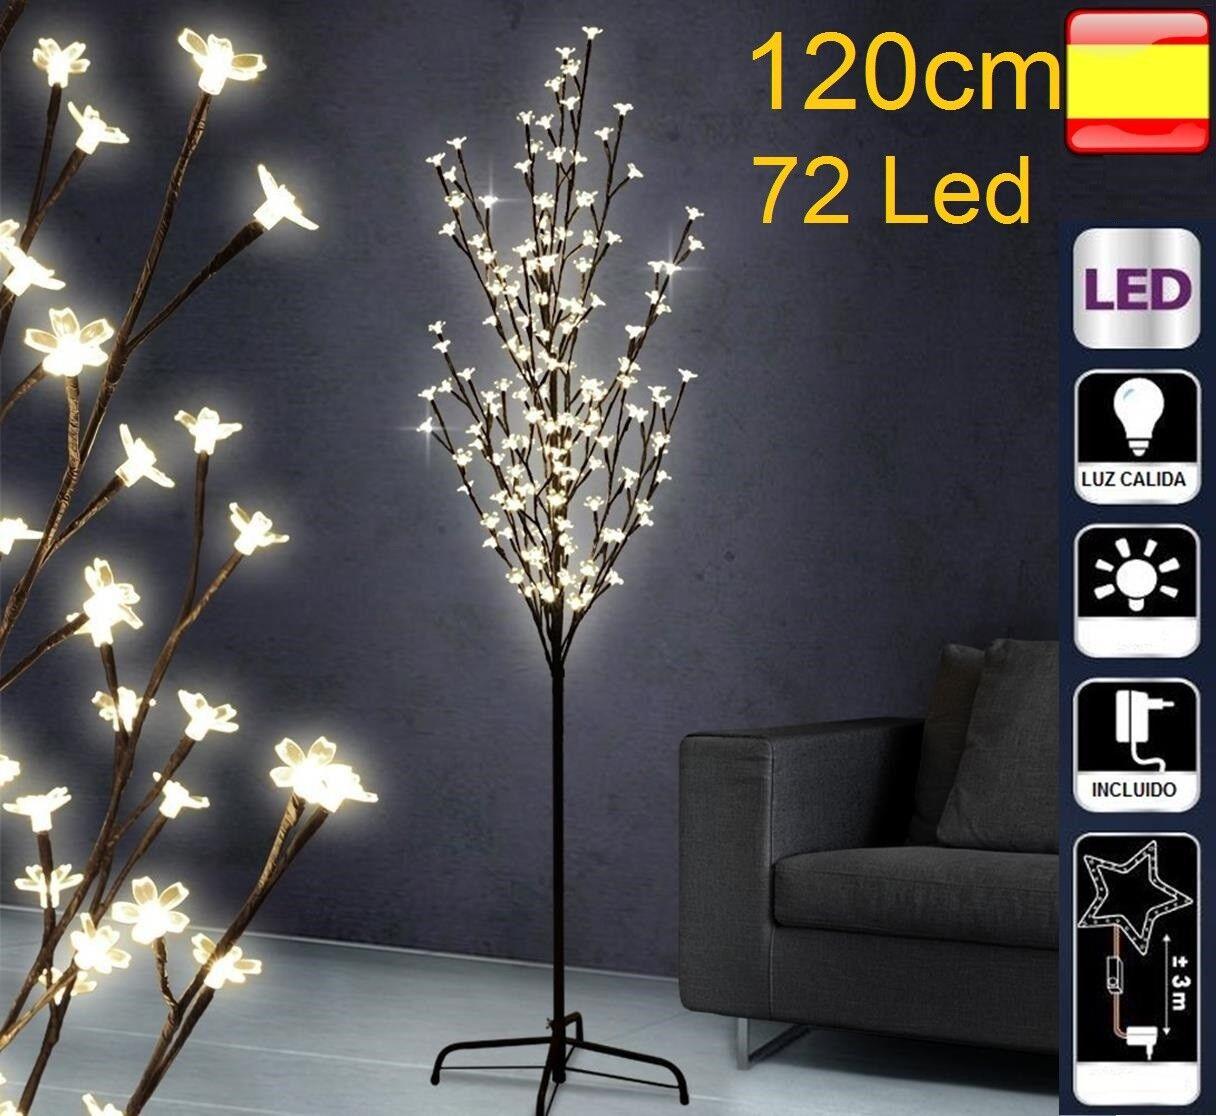 Arbol de navidad con luces led 1,2m 120cm 72 Led cerezo decorativo